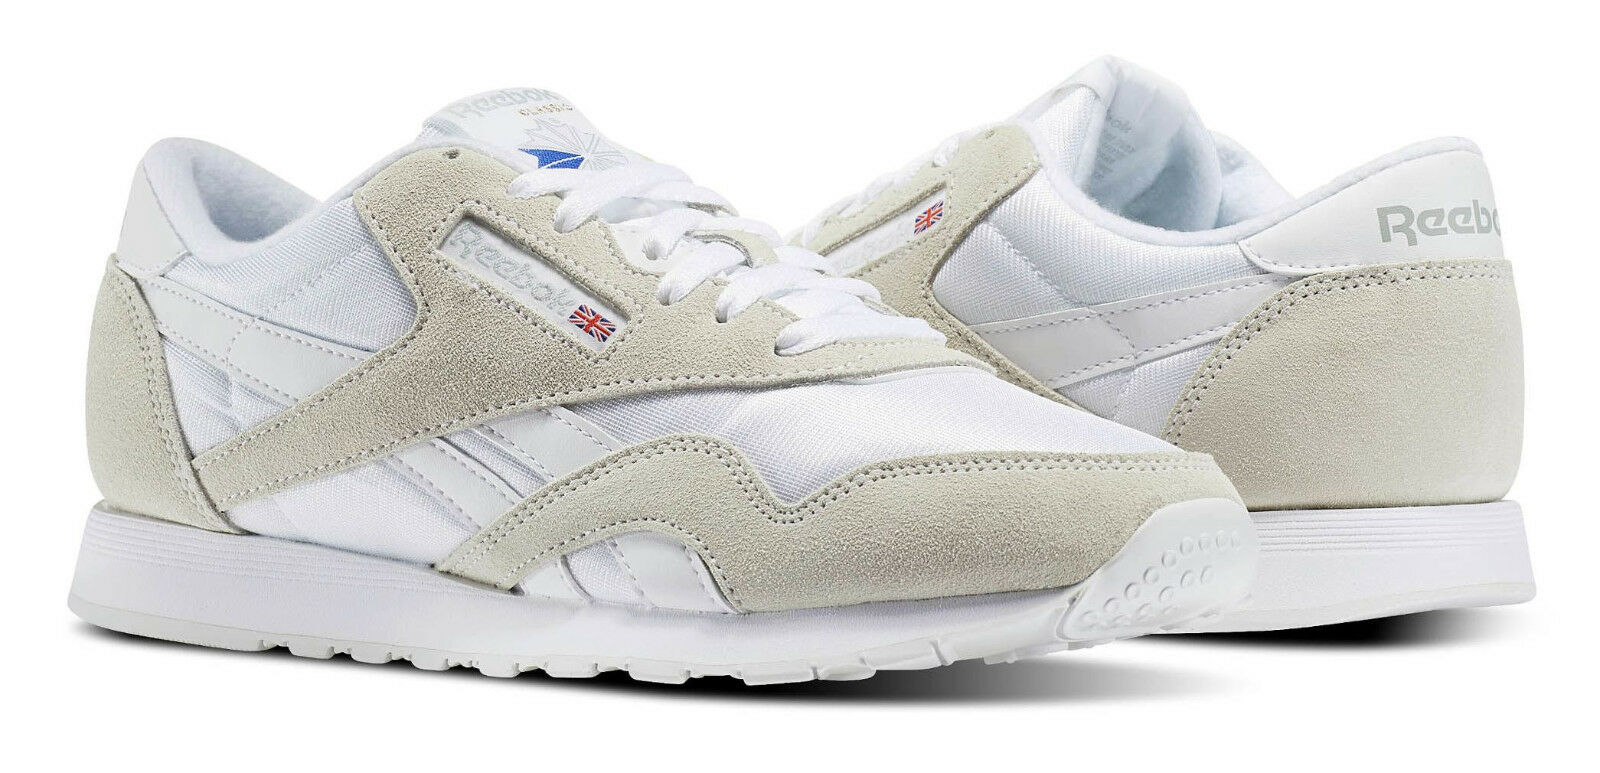 Reebok classic nylon hellgrau, weiße männer laufen tennisschuhe posten 6390